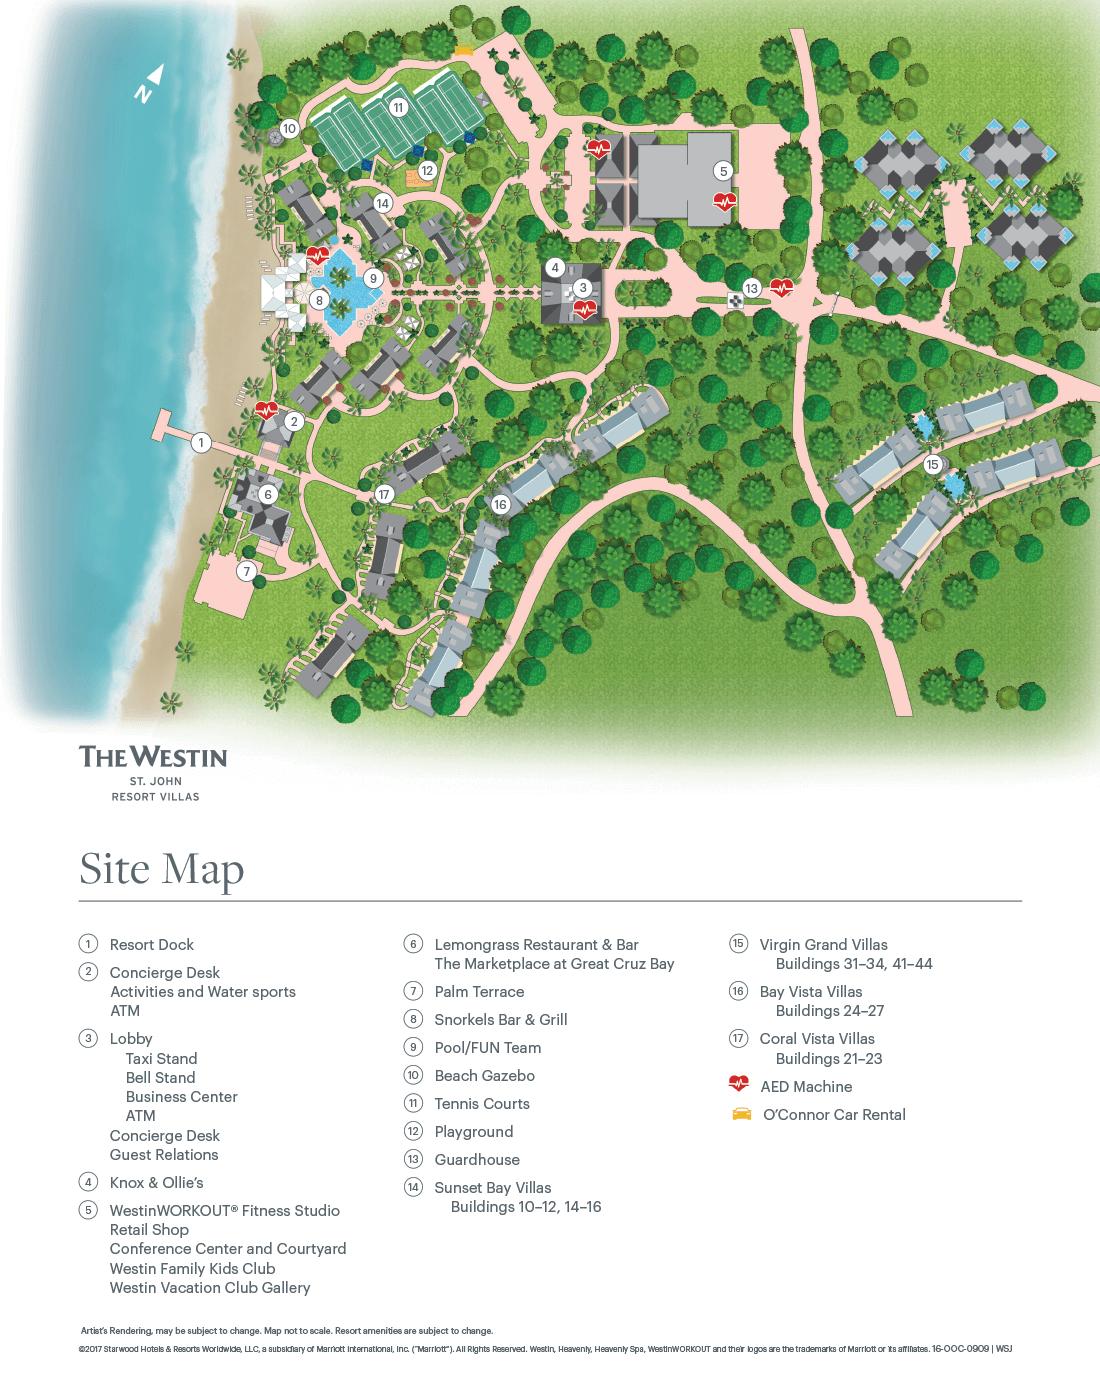 The Westin St John Resort Villas Map